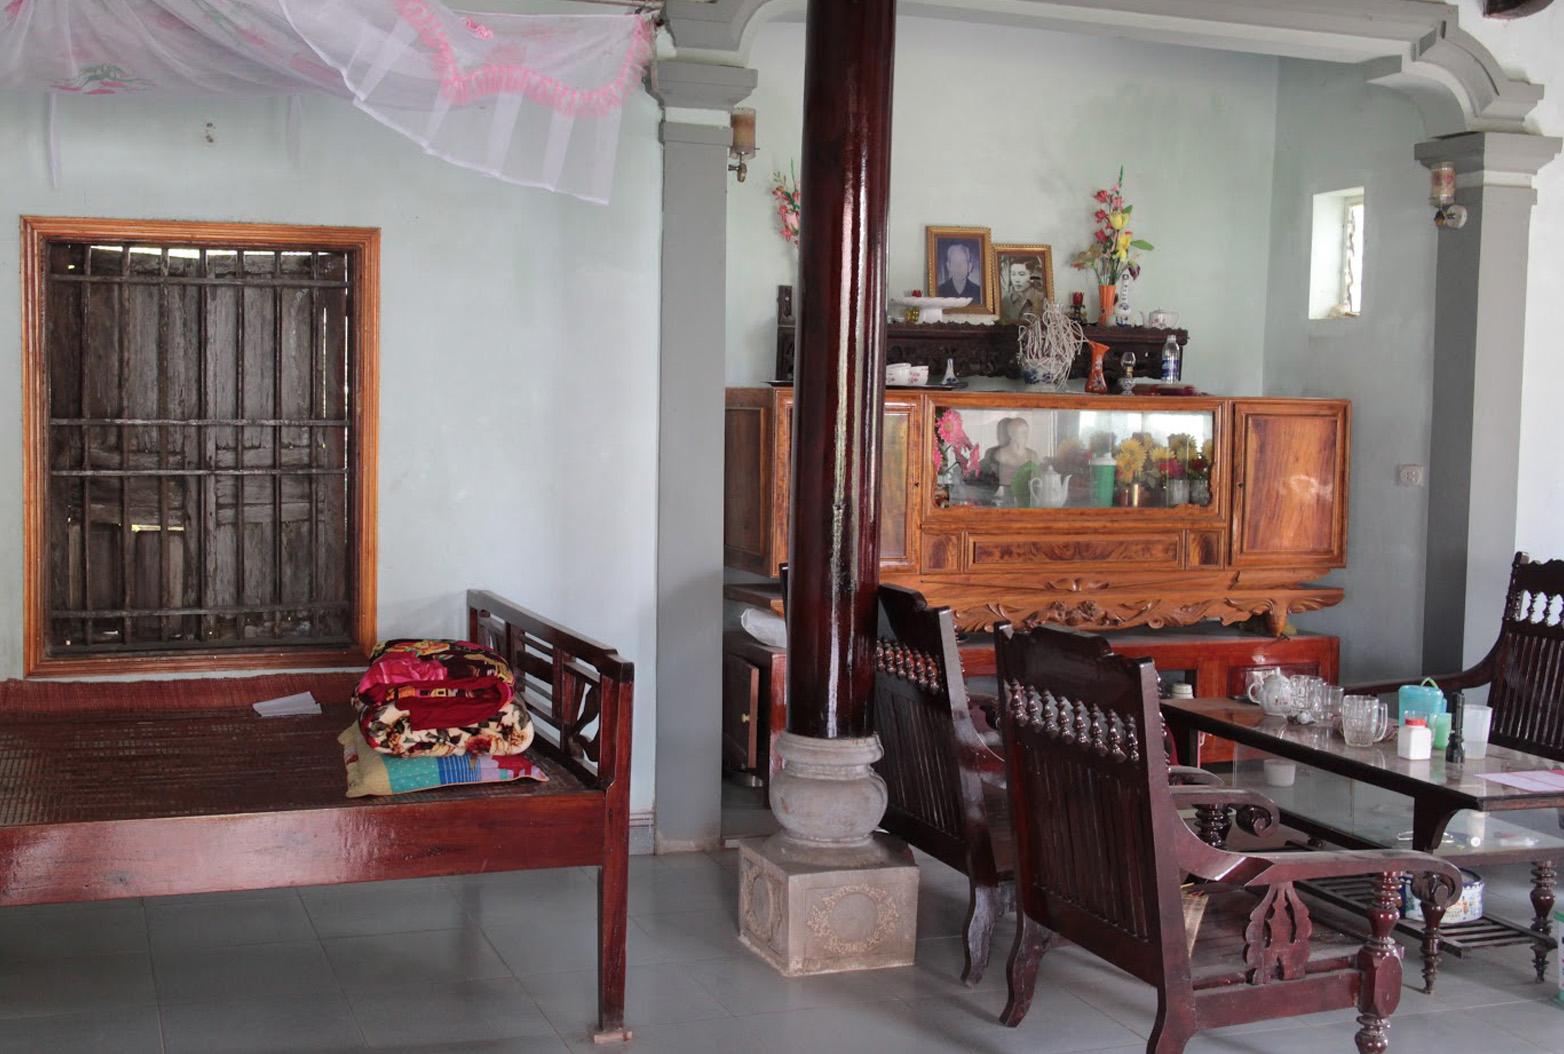 Duara_village_quynh_nqoc_livingroom.jpg